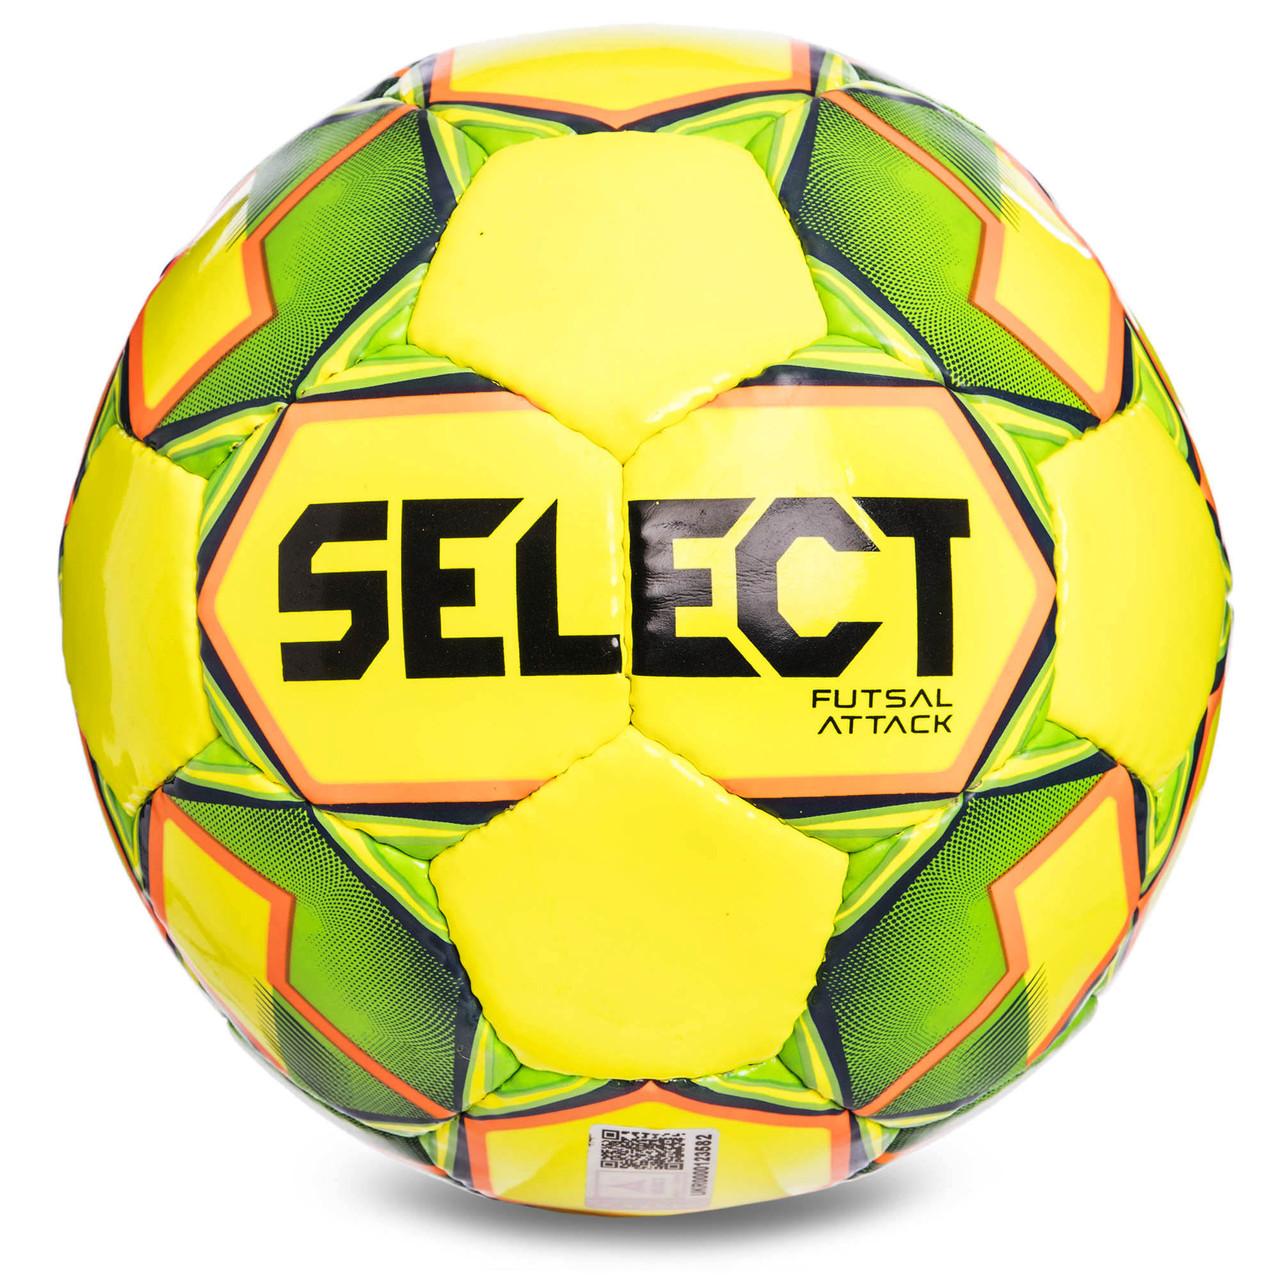 Мяч футзальный №4 SELECT FUTSAL ATTACK (FPUG 1100, желтый-зеленый-оранжевый)